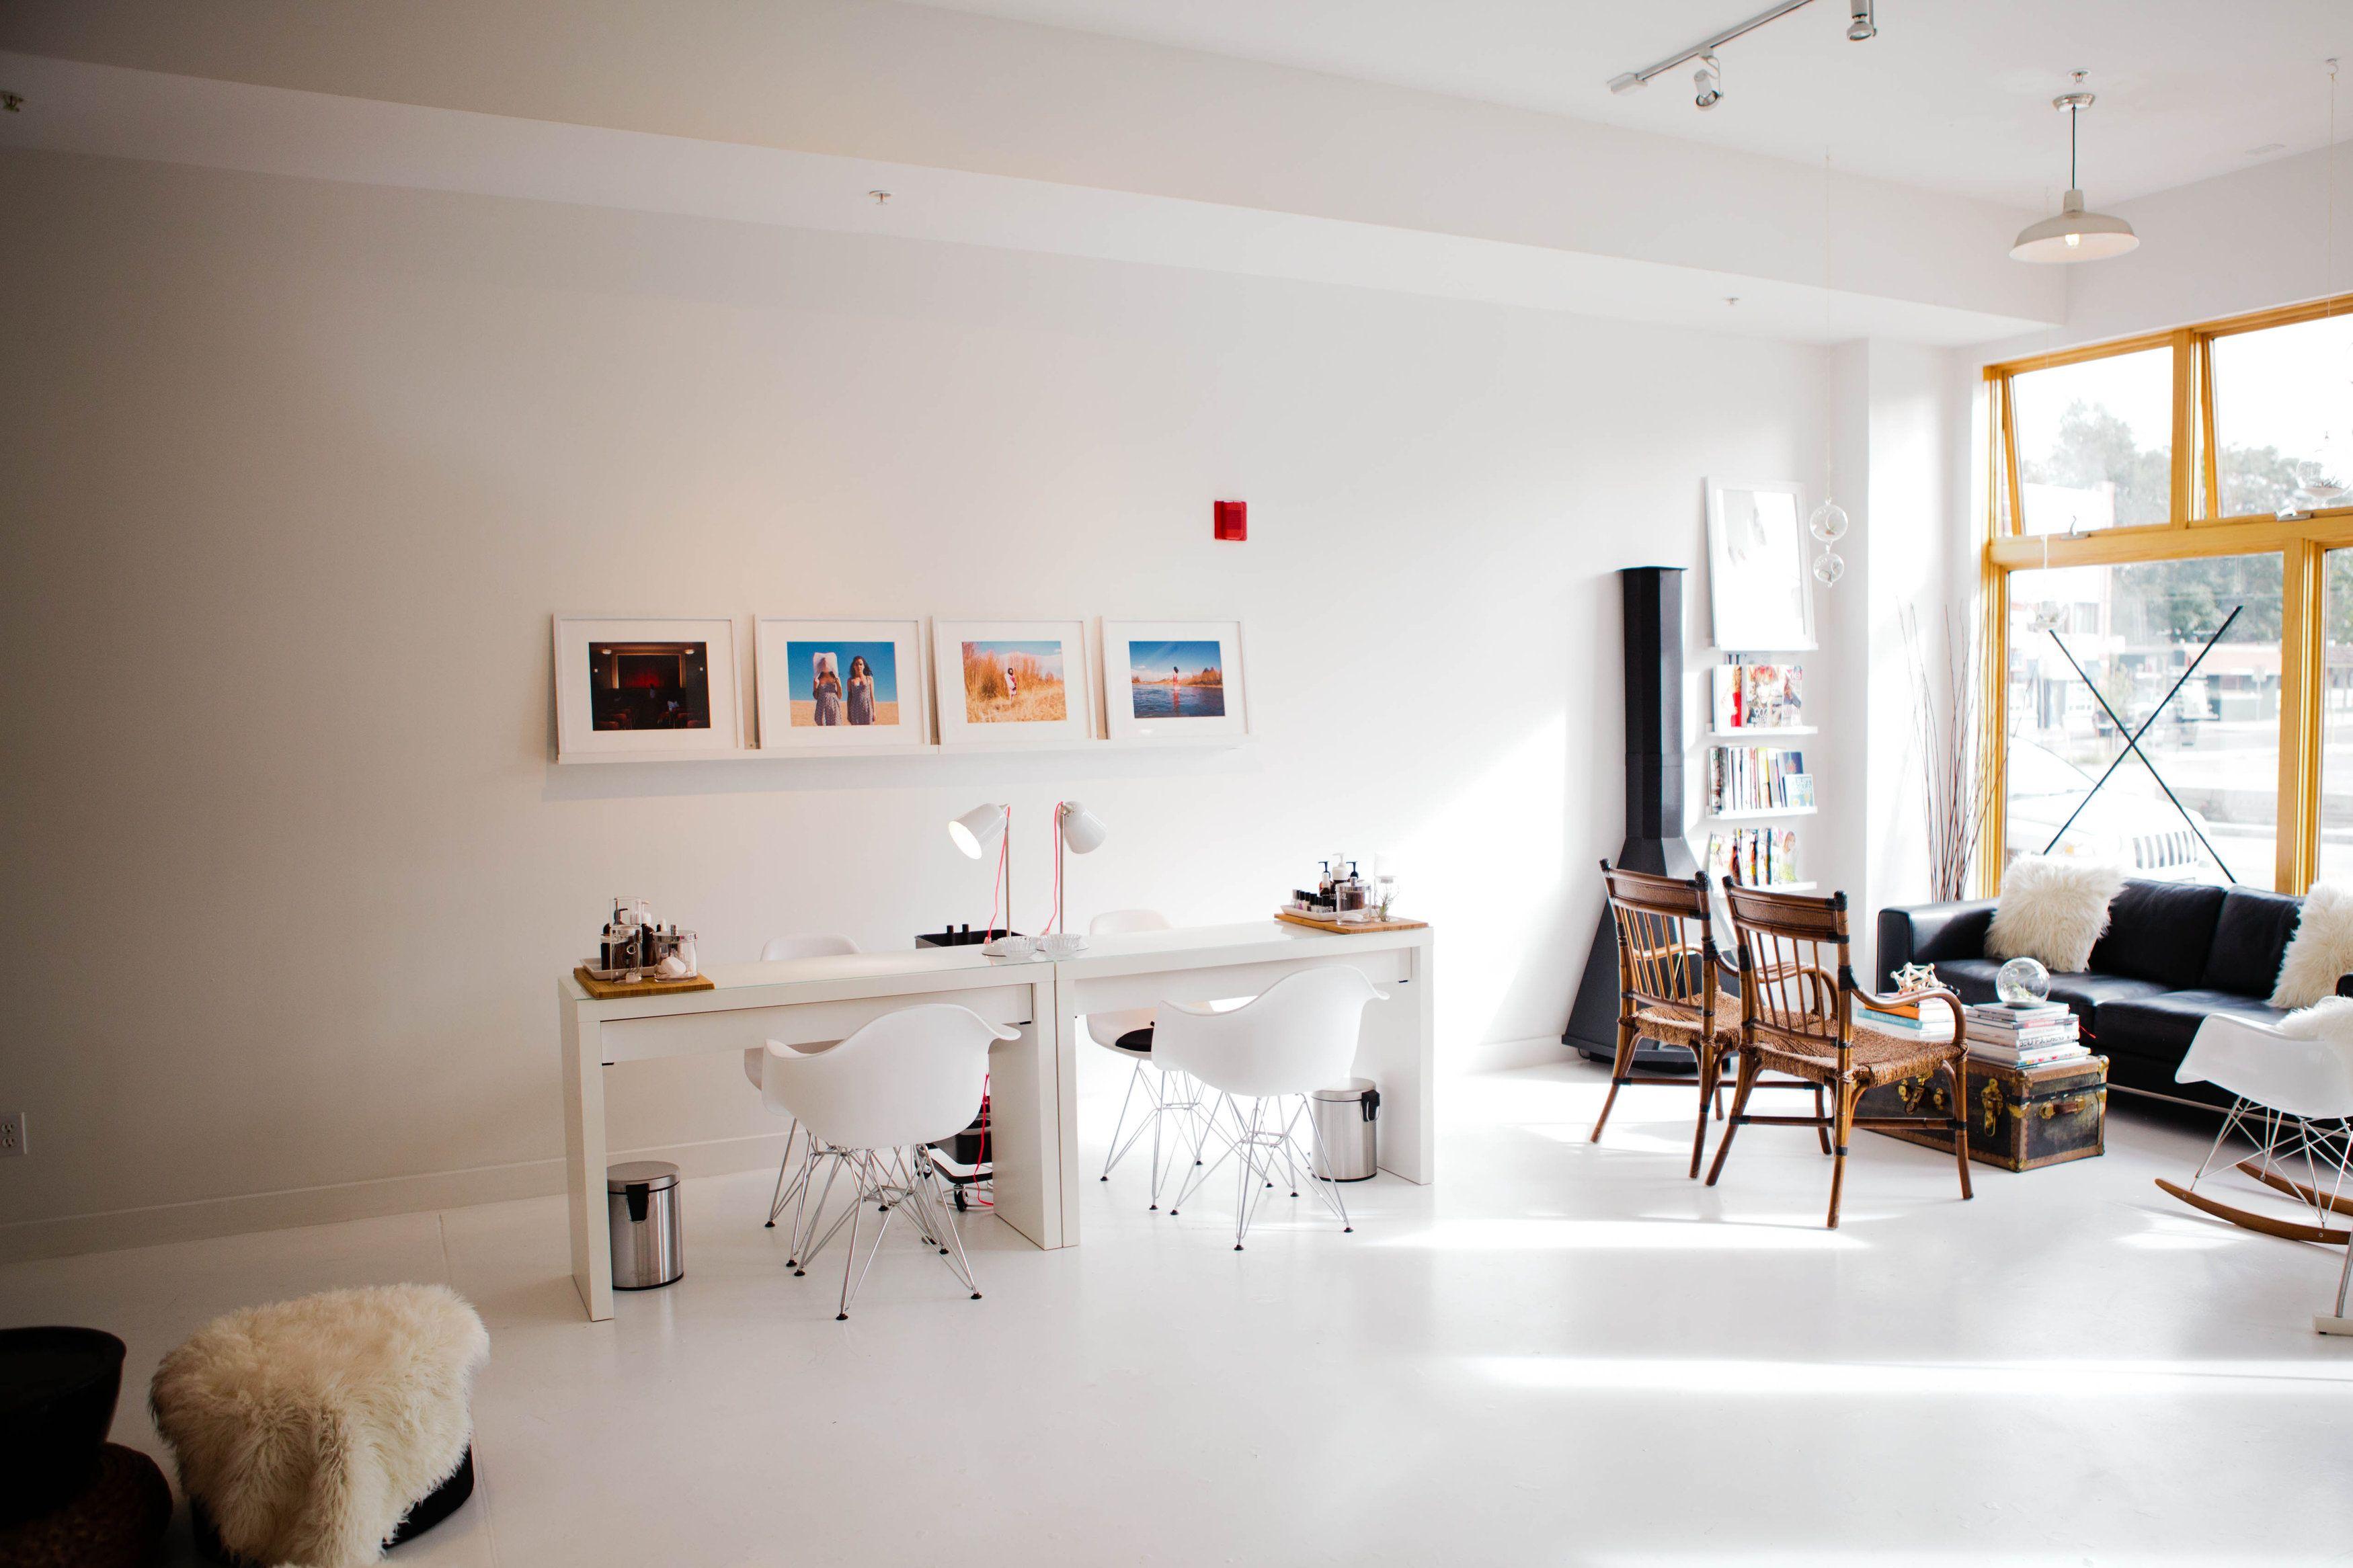 Base coat modern nail salon x gallery located in denver - Base coat nail salon ...